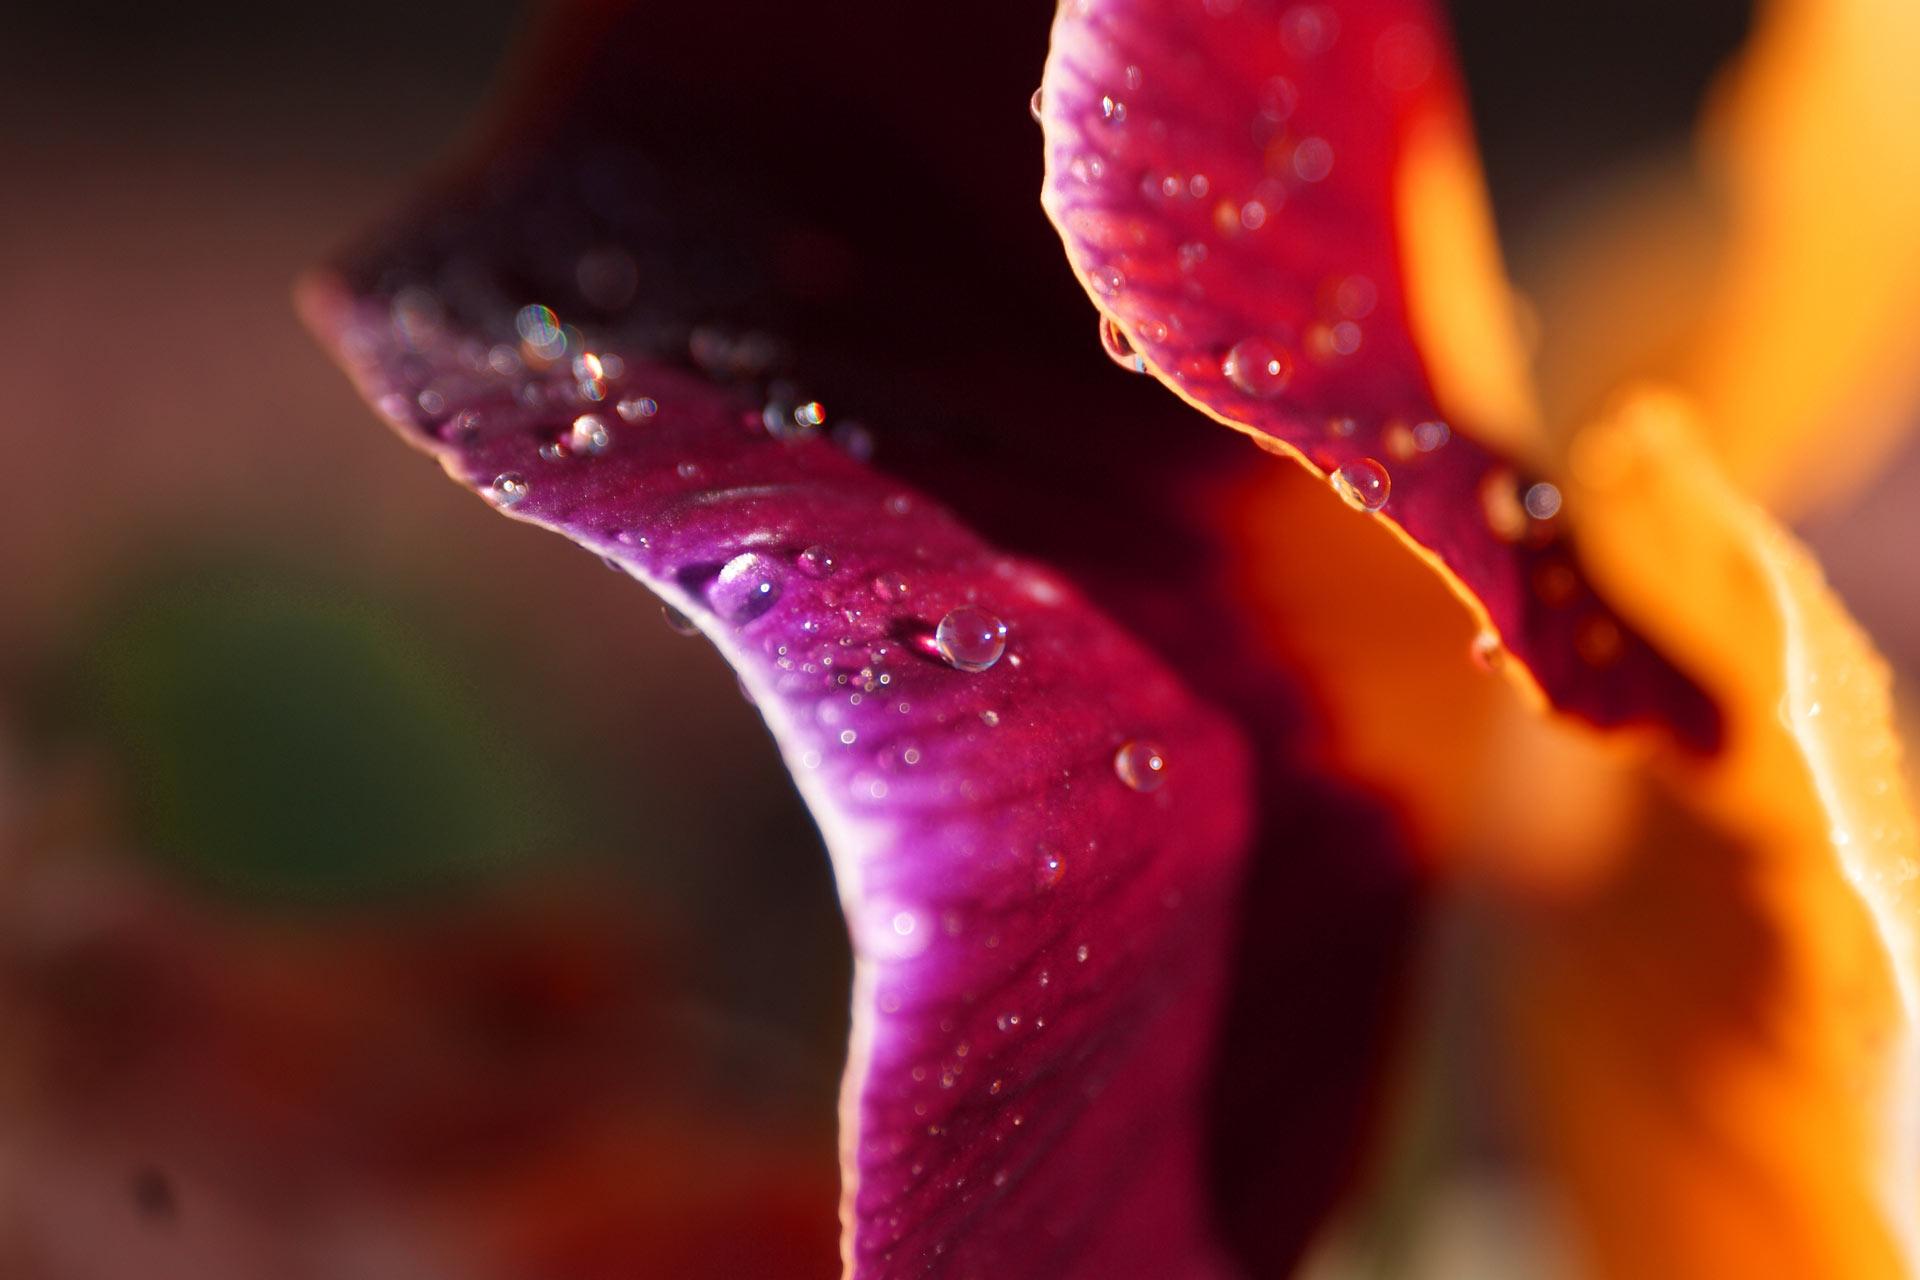 http://2.bp.blogspot.com/-bUc0yHf0ZV0/T32T8JD-TOI/AAAAAAAAIaM/TWfHTapDBig/s1920/Delicate_Petals_by_lefthandgergo.jpg